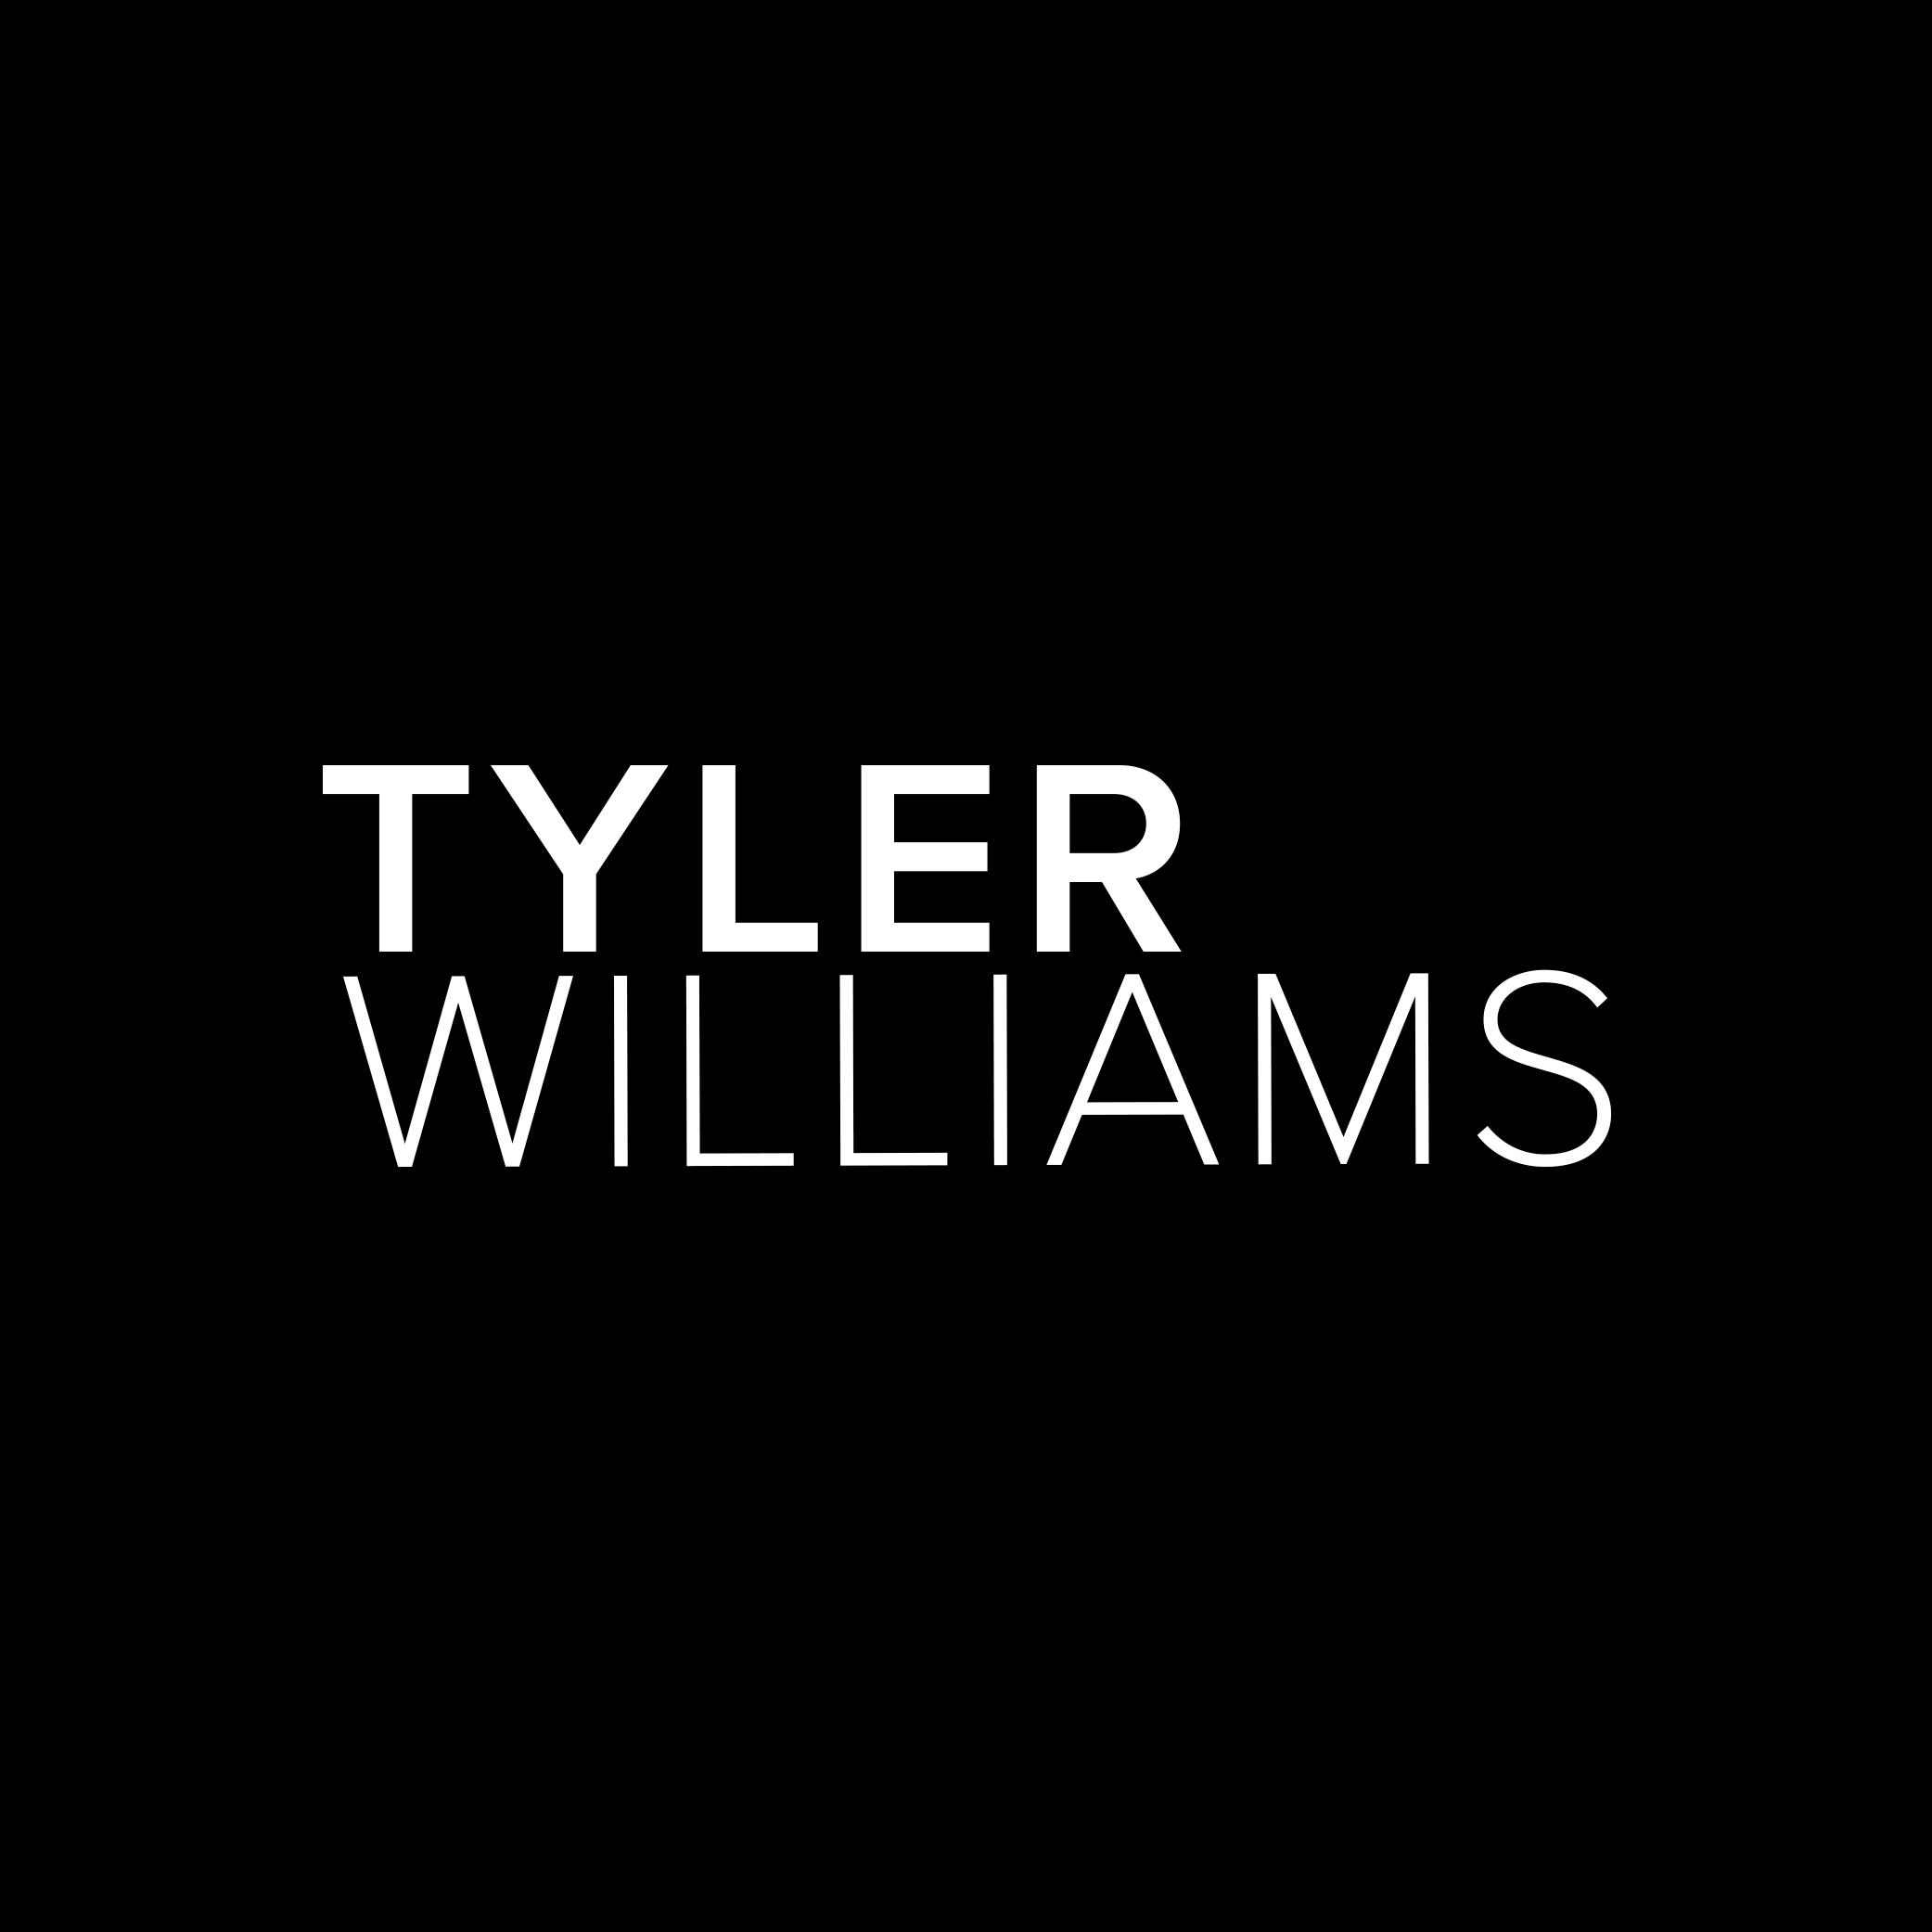 TylerWilliamsLogo.png